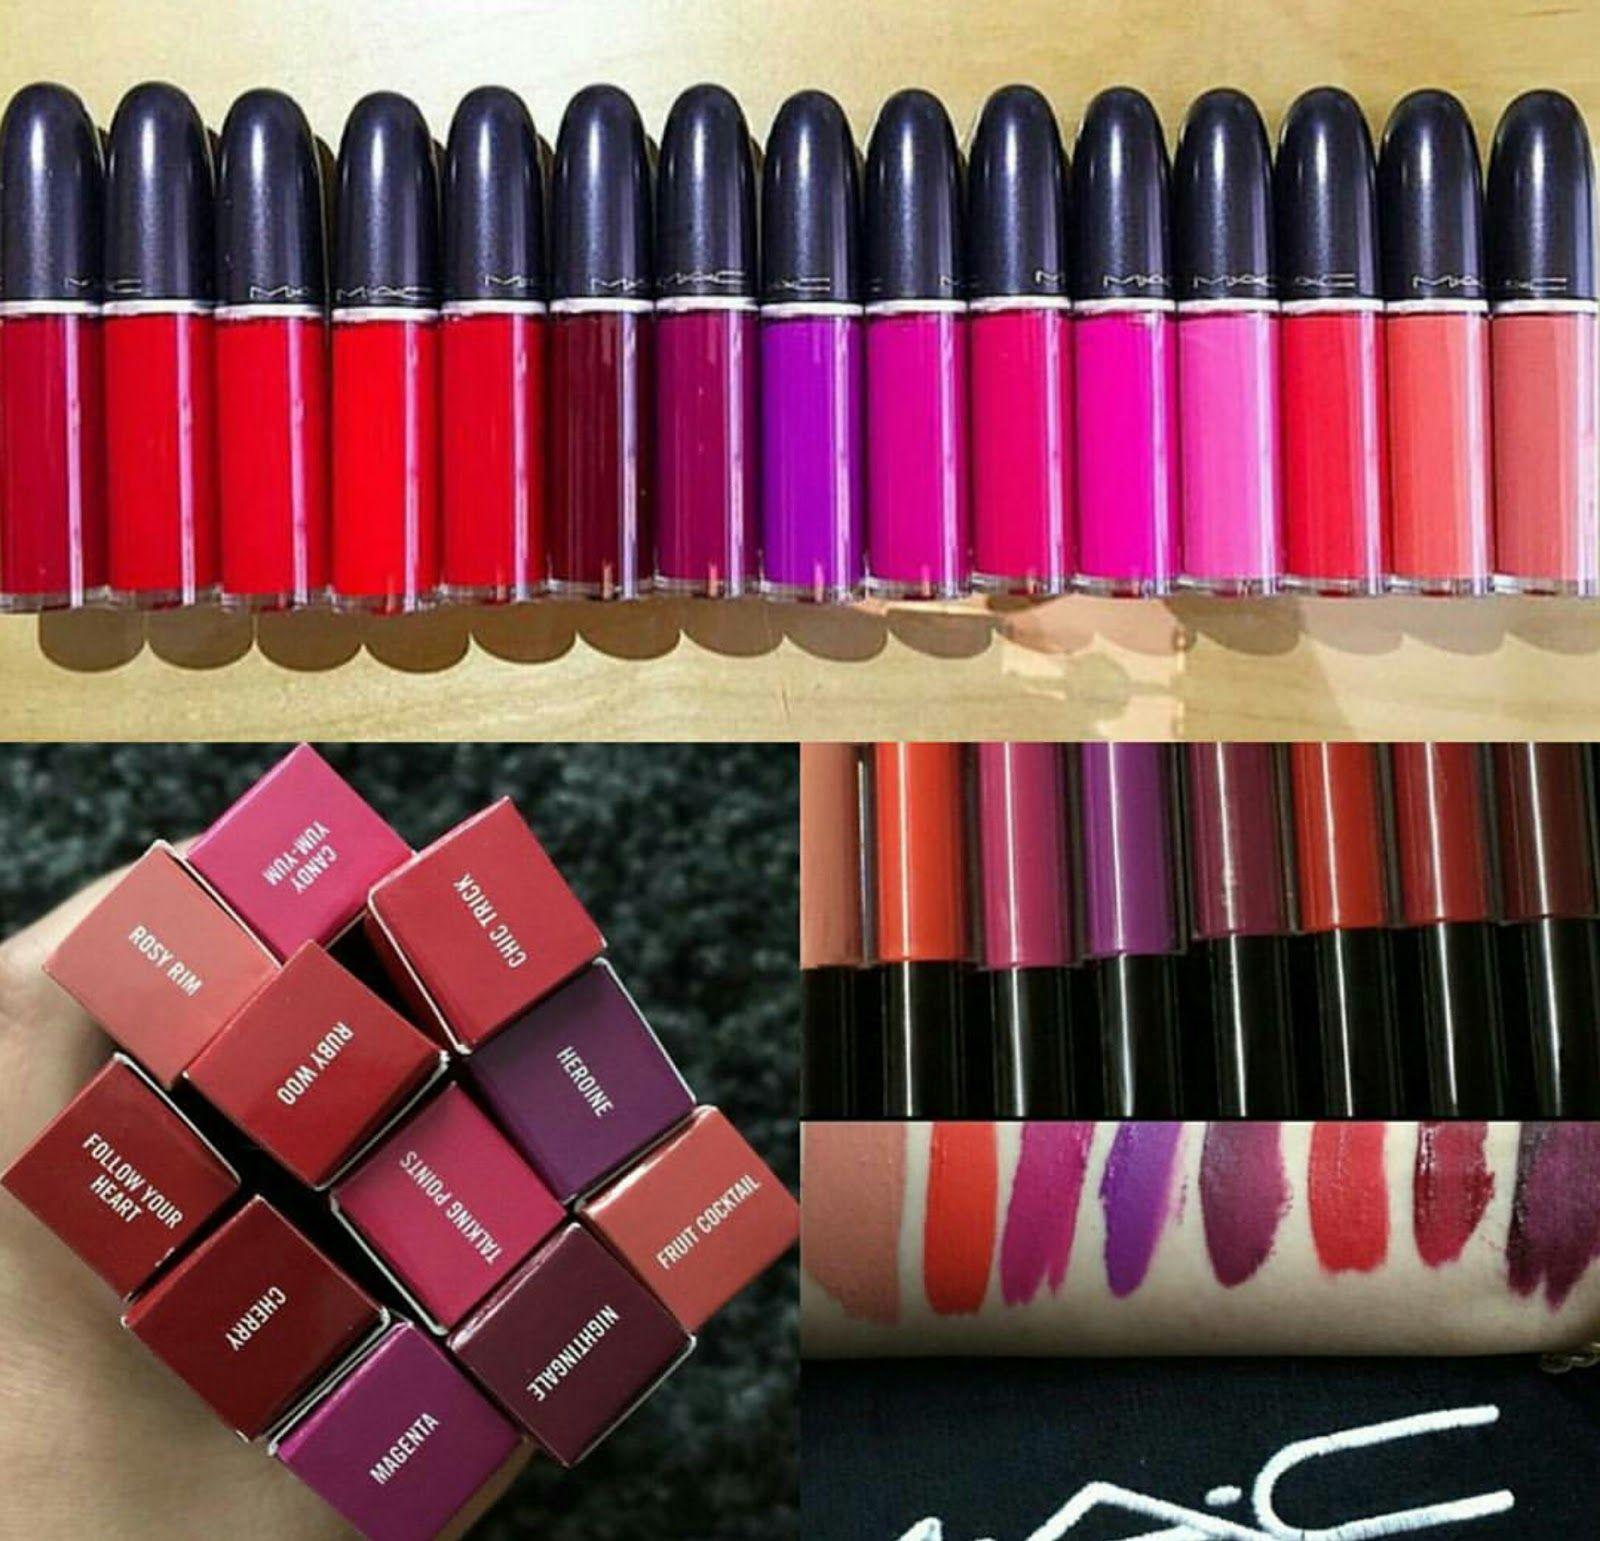 Sneak Peek MAC Retro Matte Liquid Lipsticks COMING JANUARY 7th